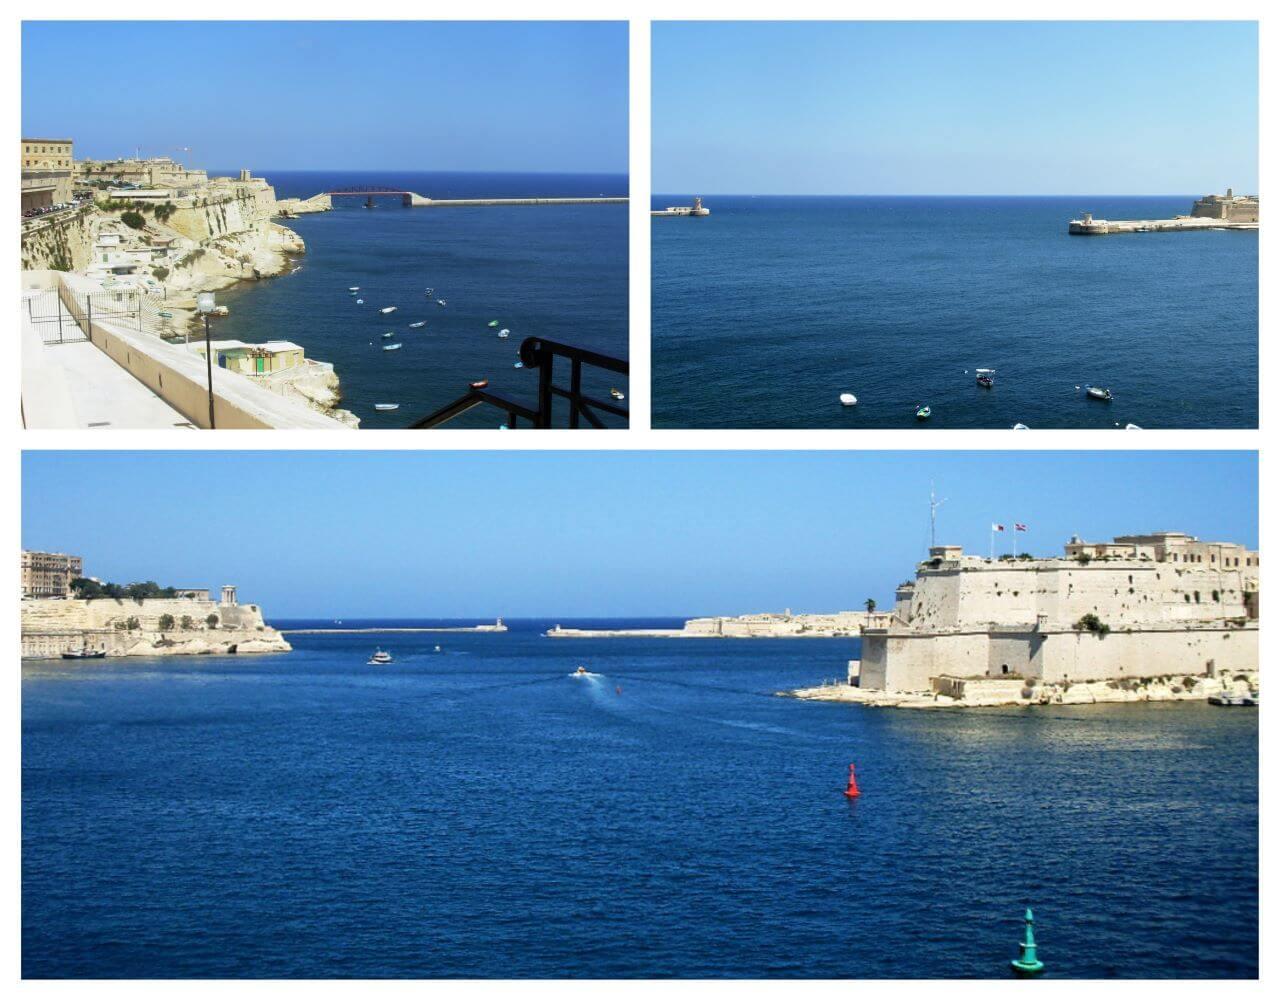 St Elmo breakwater and Risacoli breakwater, Valletta